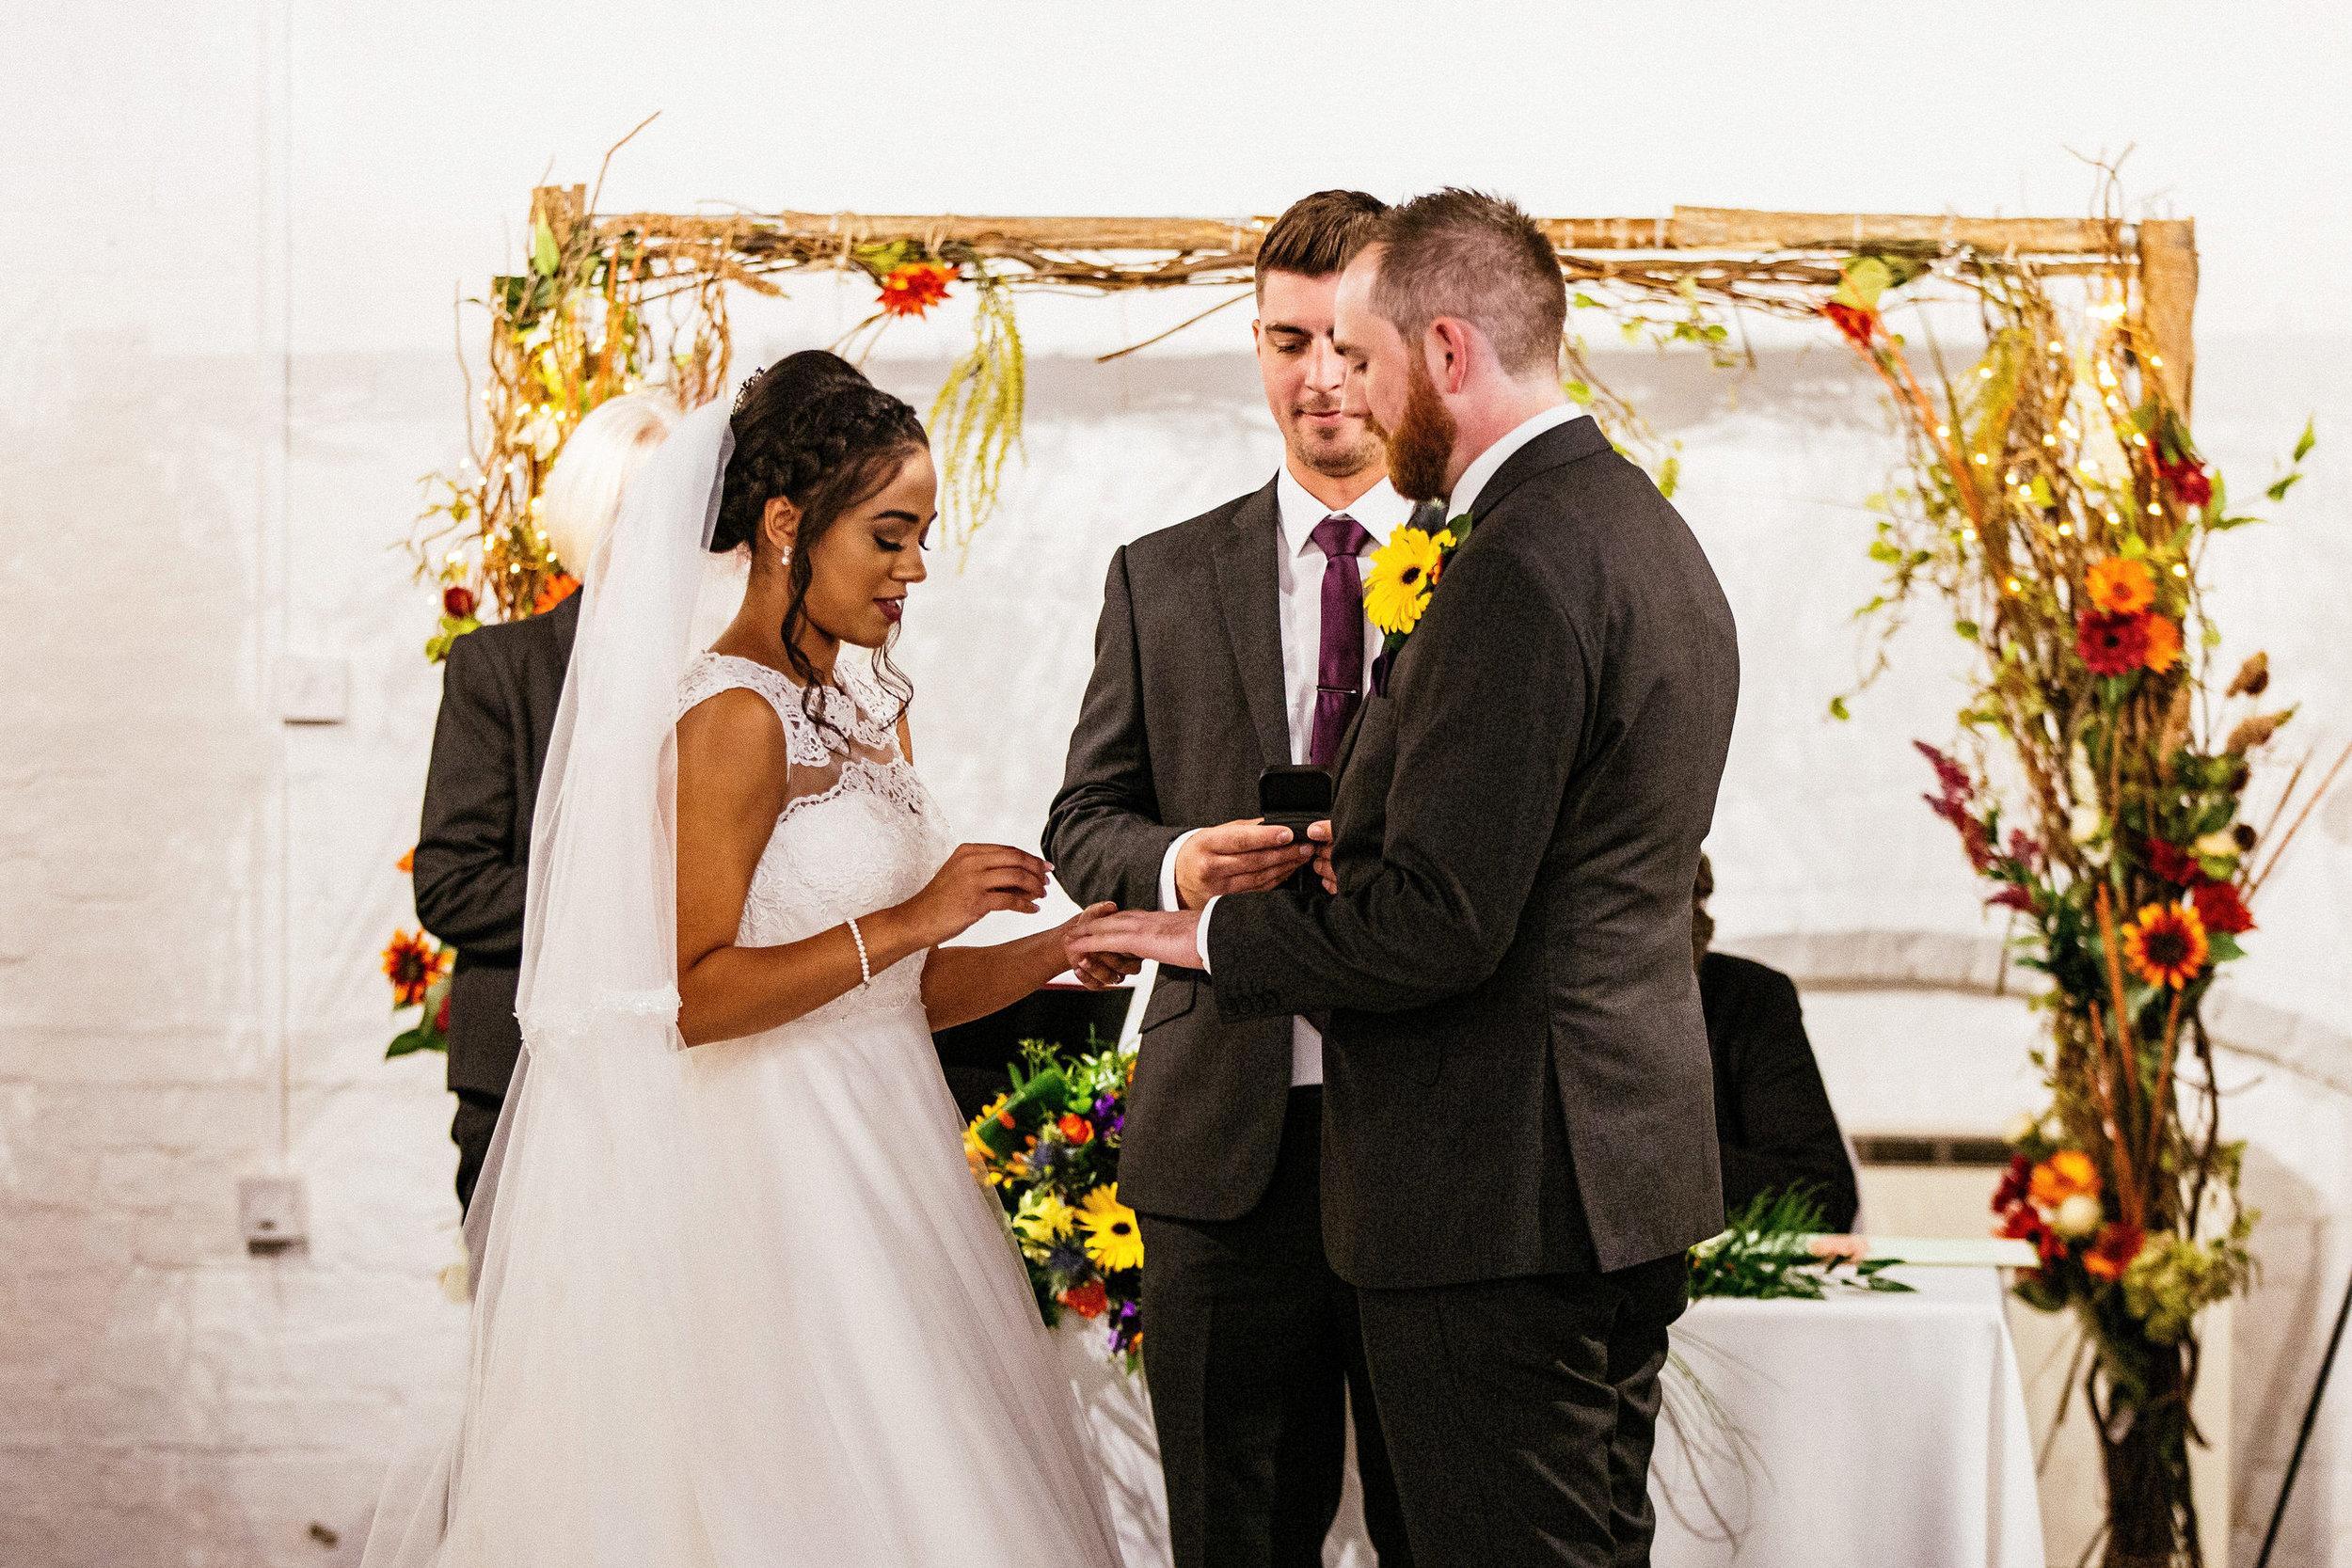 The-Bond-Company-Wedding-Photography-37-1.jpg